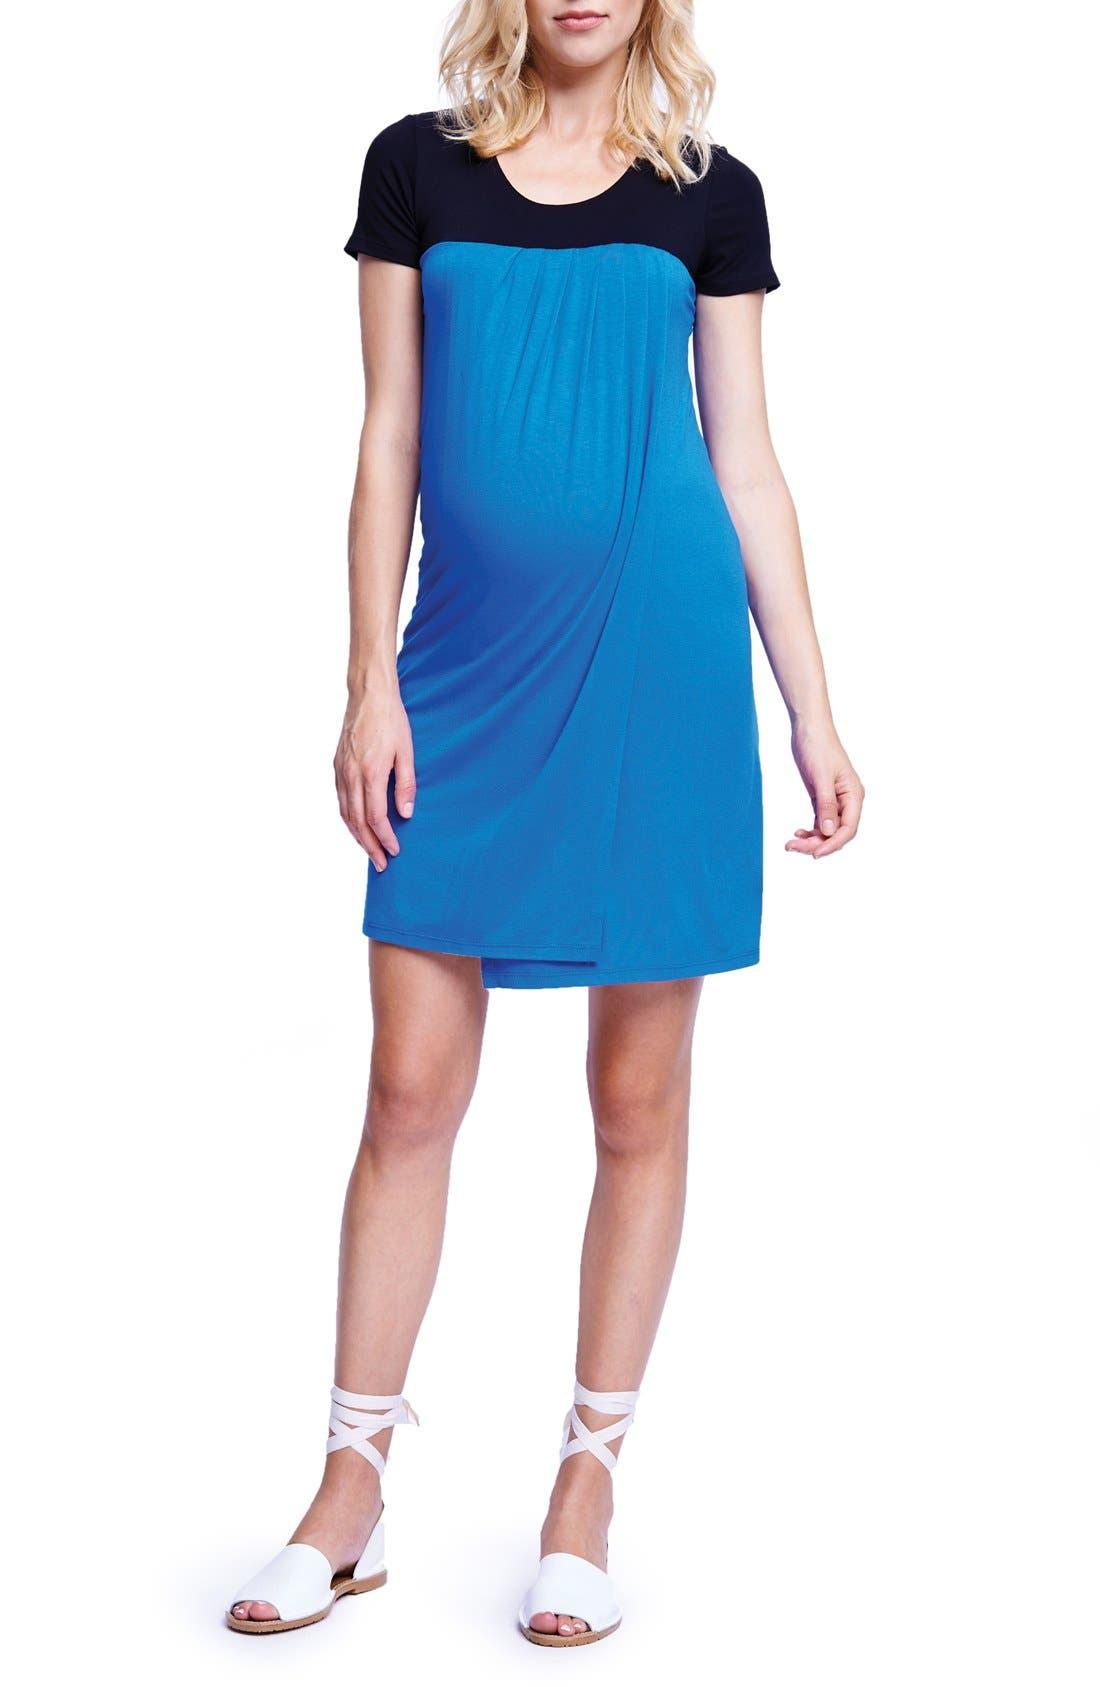 Babydoll Maternity/Nursing Dress,                         Main,                         color, Blk/ Royal Blue